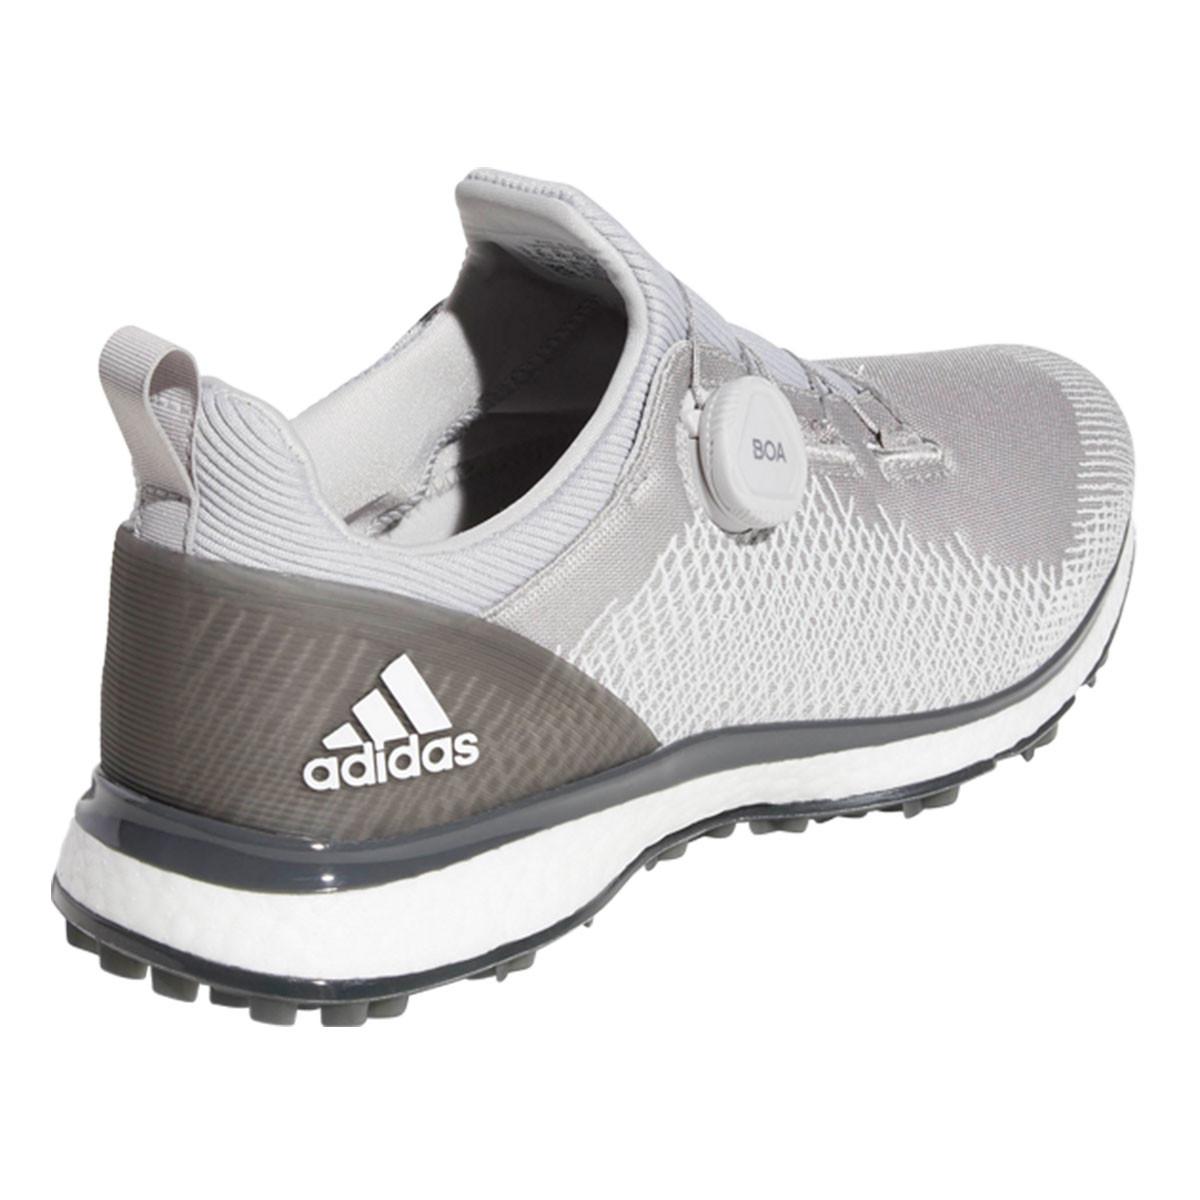 c7c793debc46 adidas Golf Mens 2019 Forgefiber Boa Golf Shoes